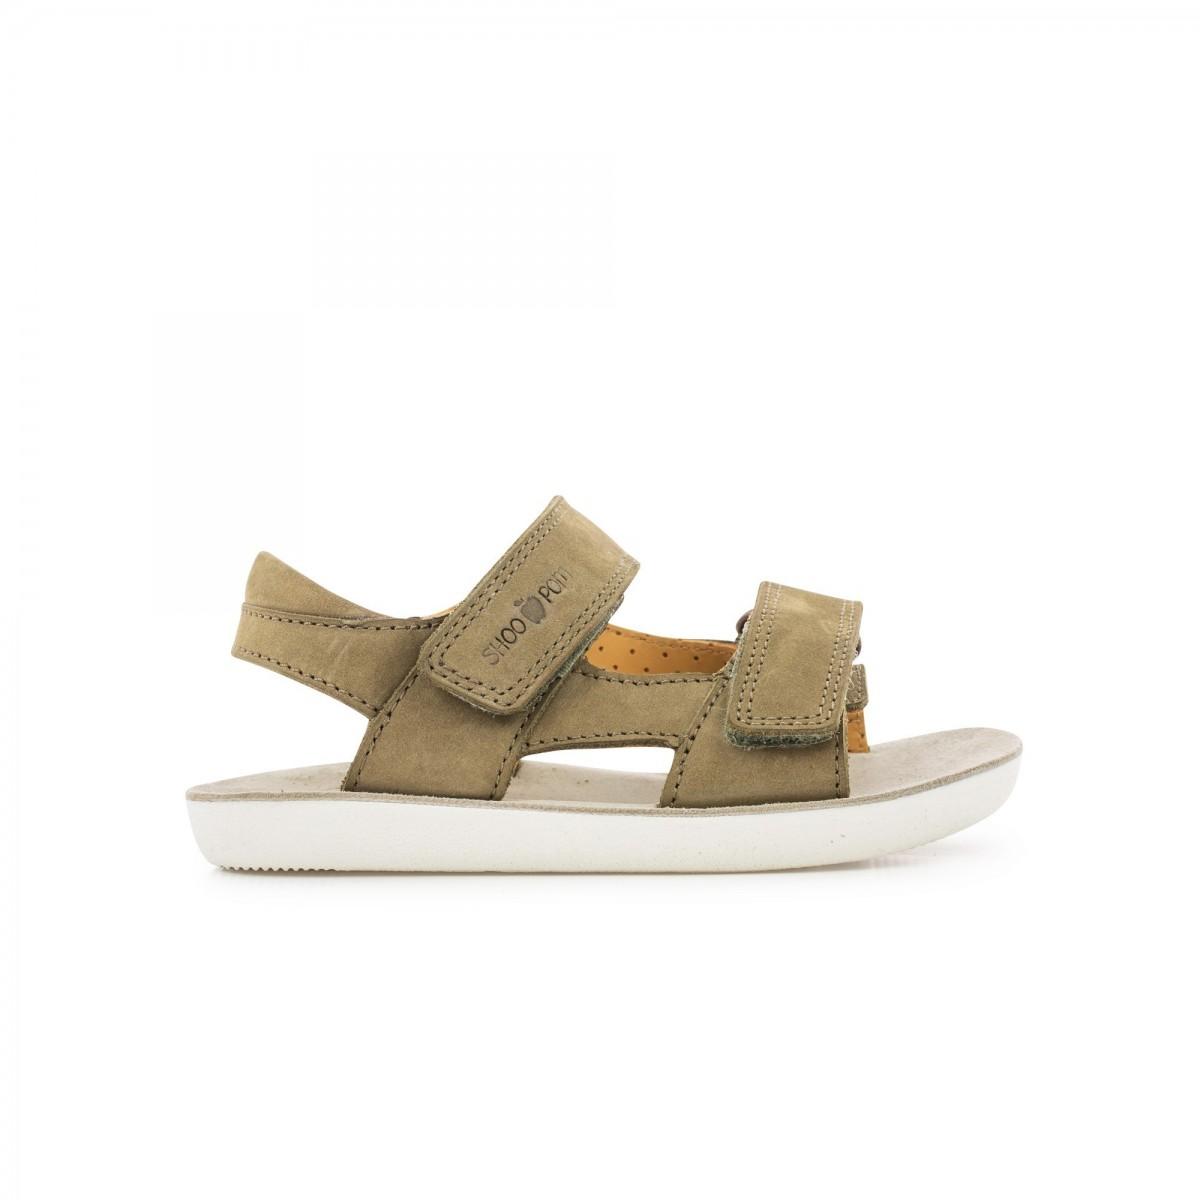 Sandale Goa Scratch Nubuck Kaki